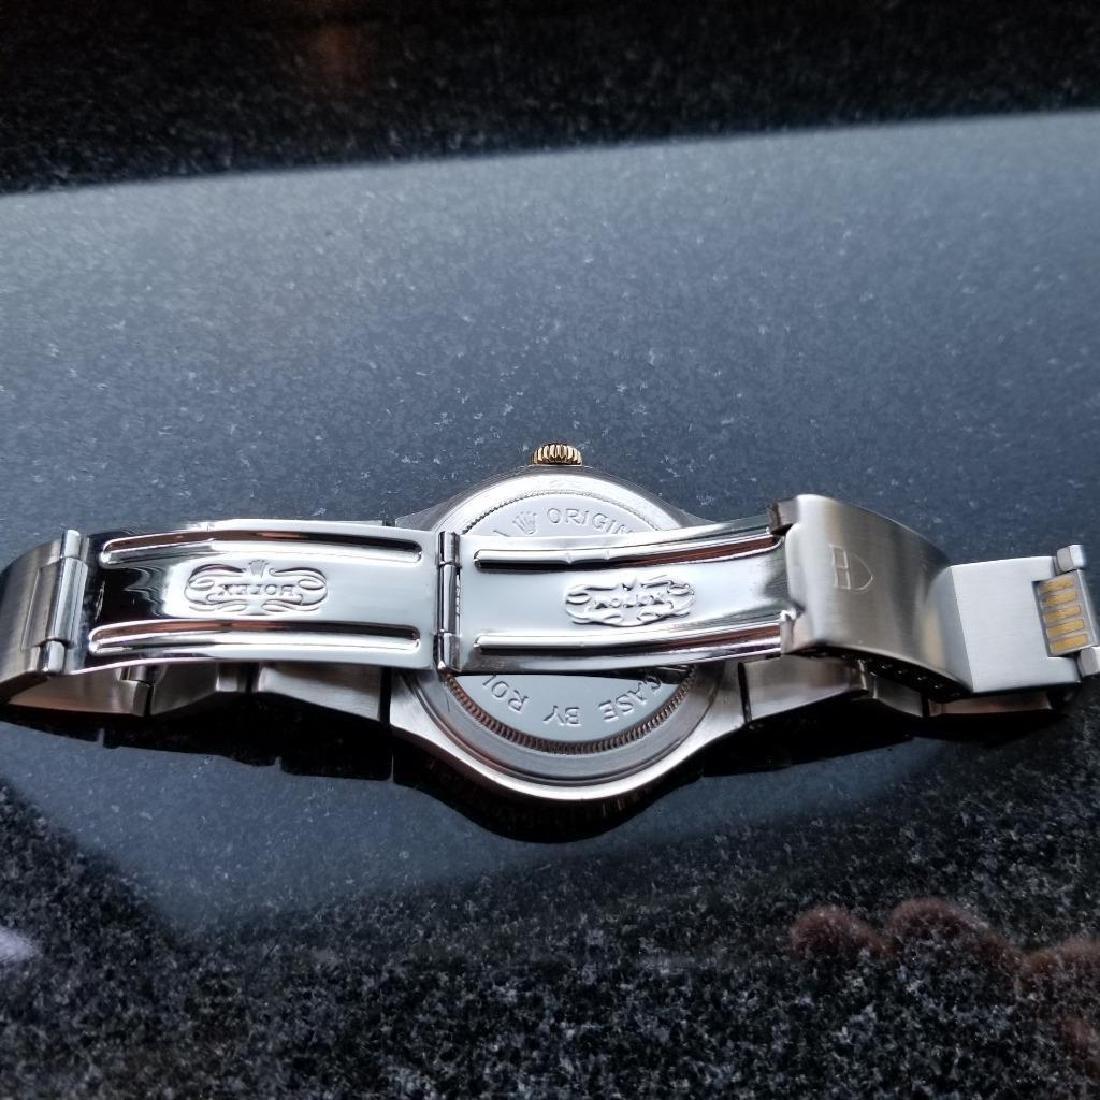 Rolex Vintage Tudor Prince Oysterdate 1975 Automatic - 9